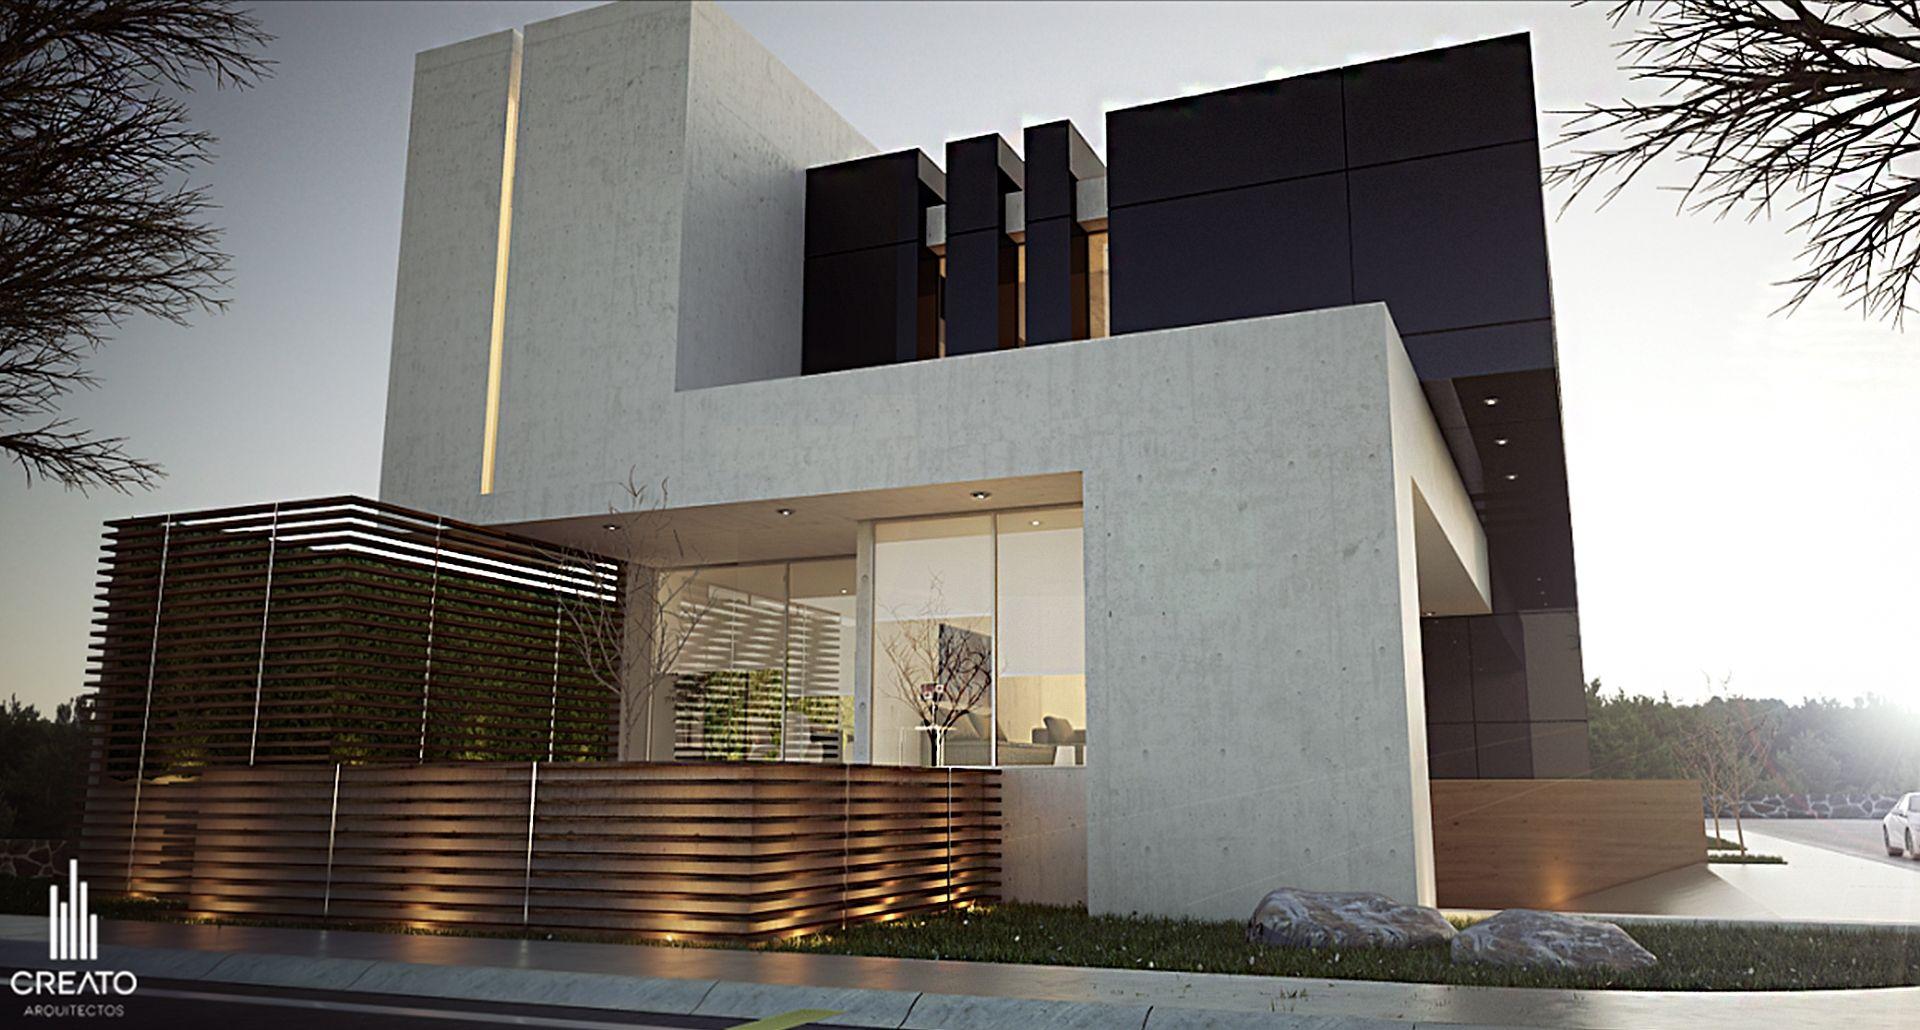 Provenza guadalajara mex creato arquitectos lomas for Casa minimalista guadalajara